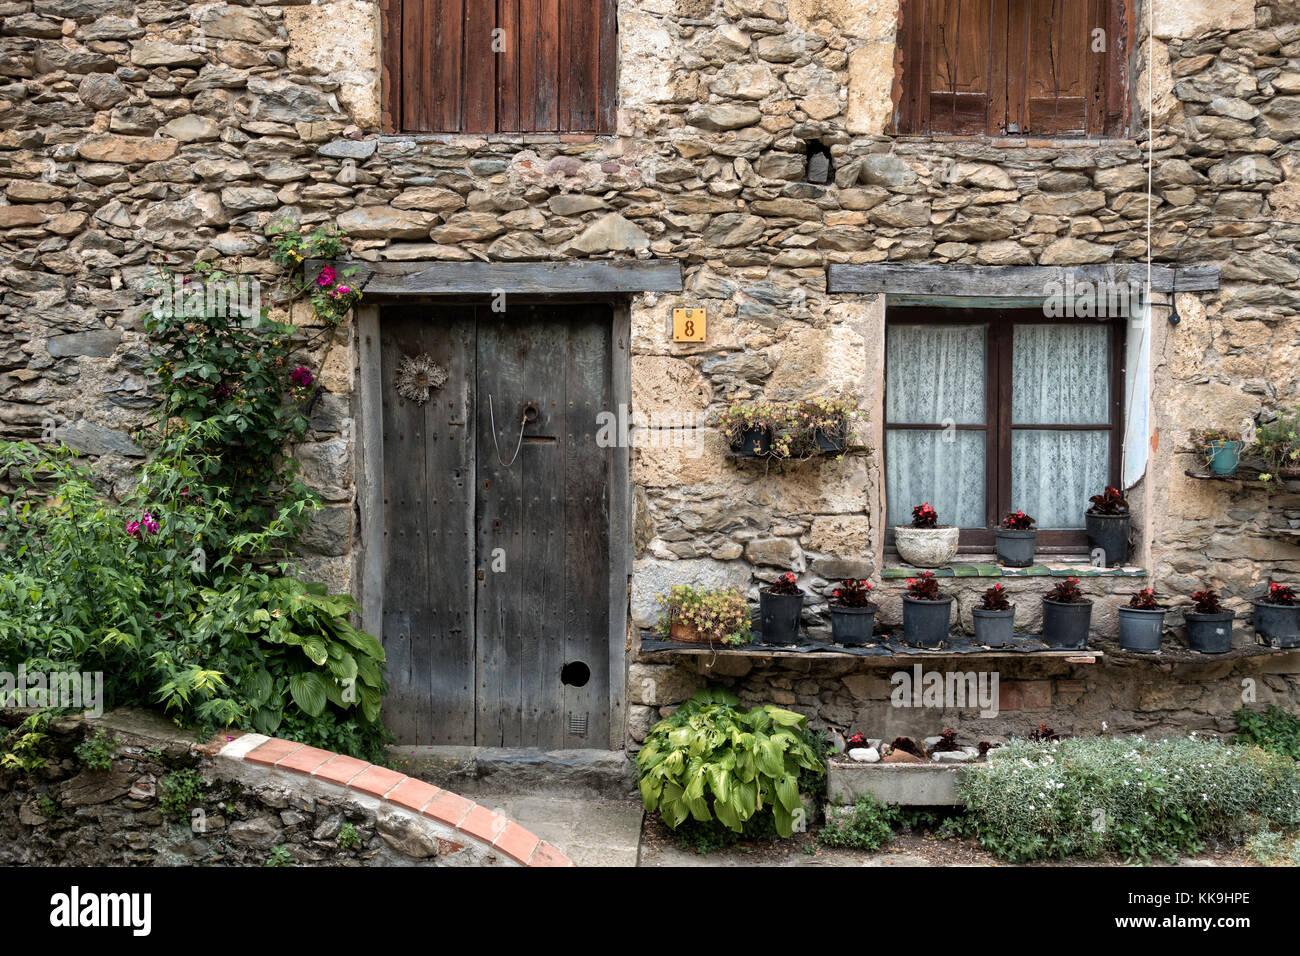 Old stone house.Beget village.Gerona.Catalonia.Spain - Stock Image